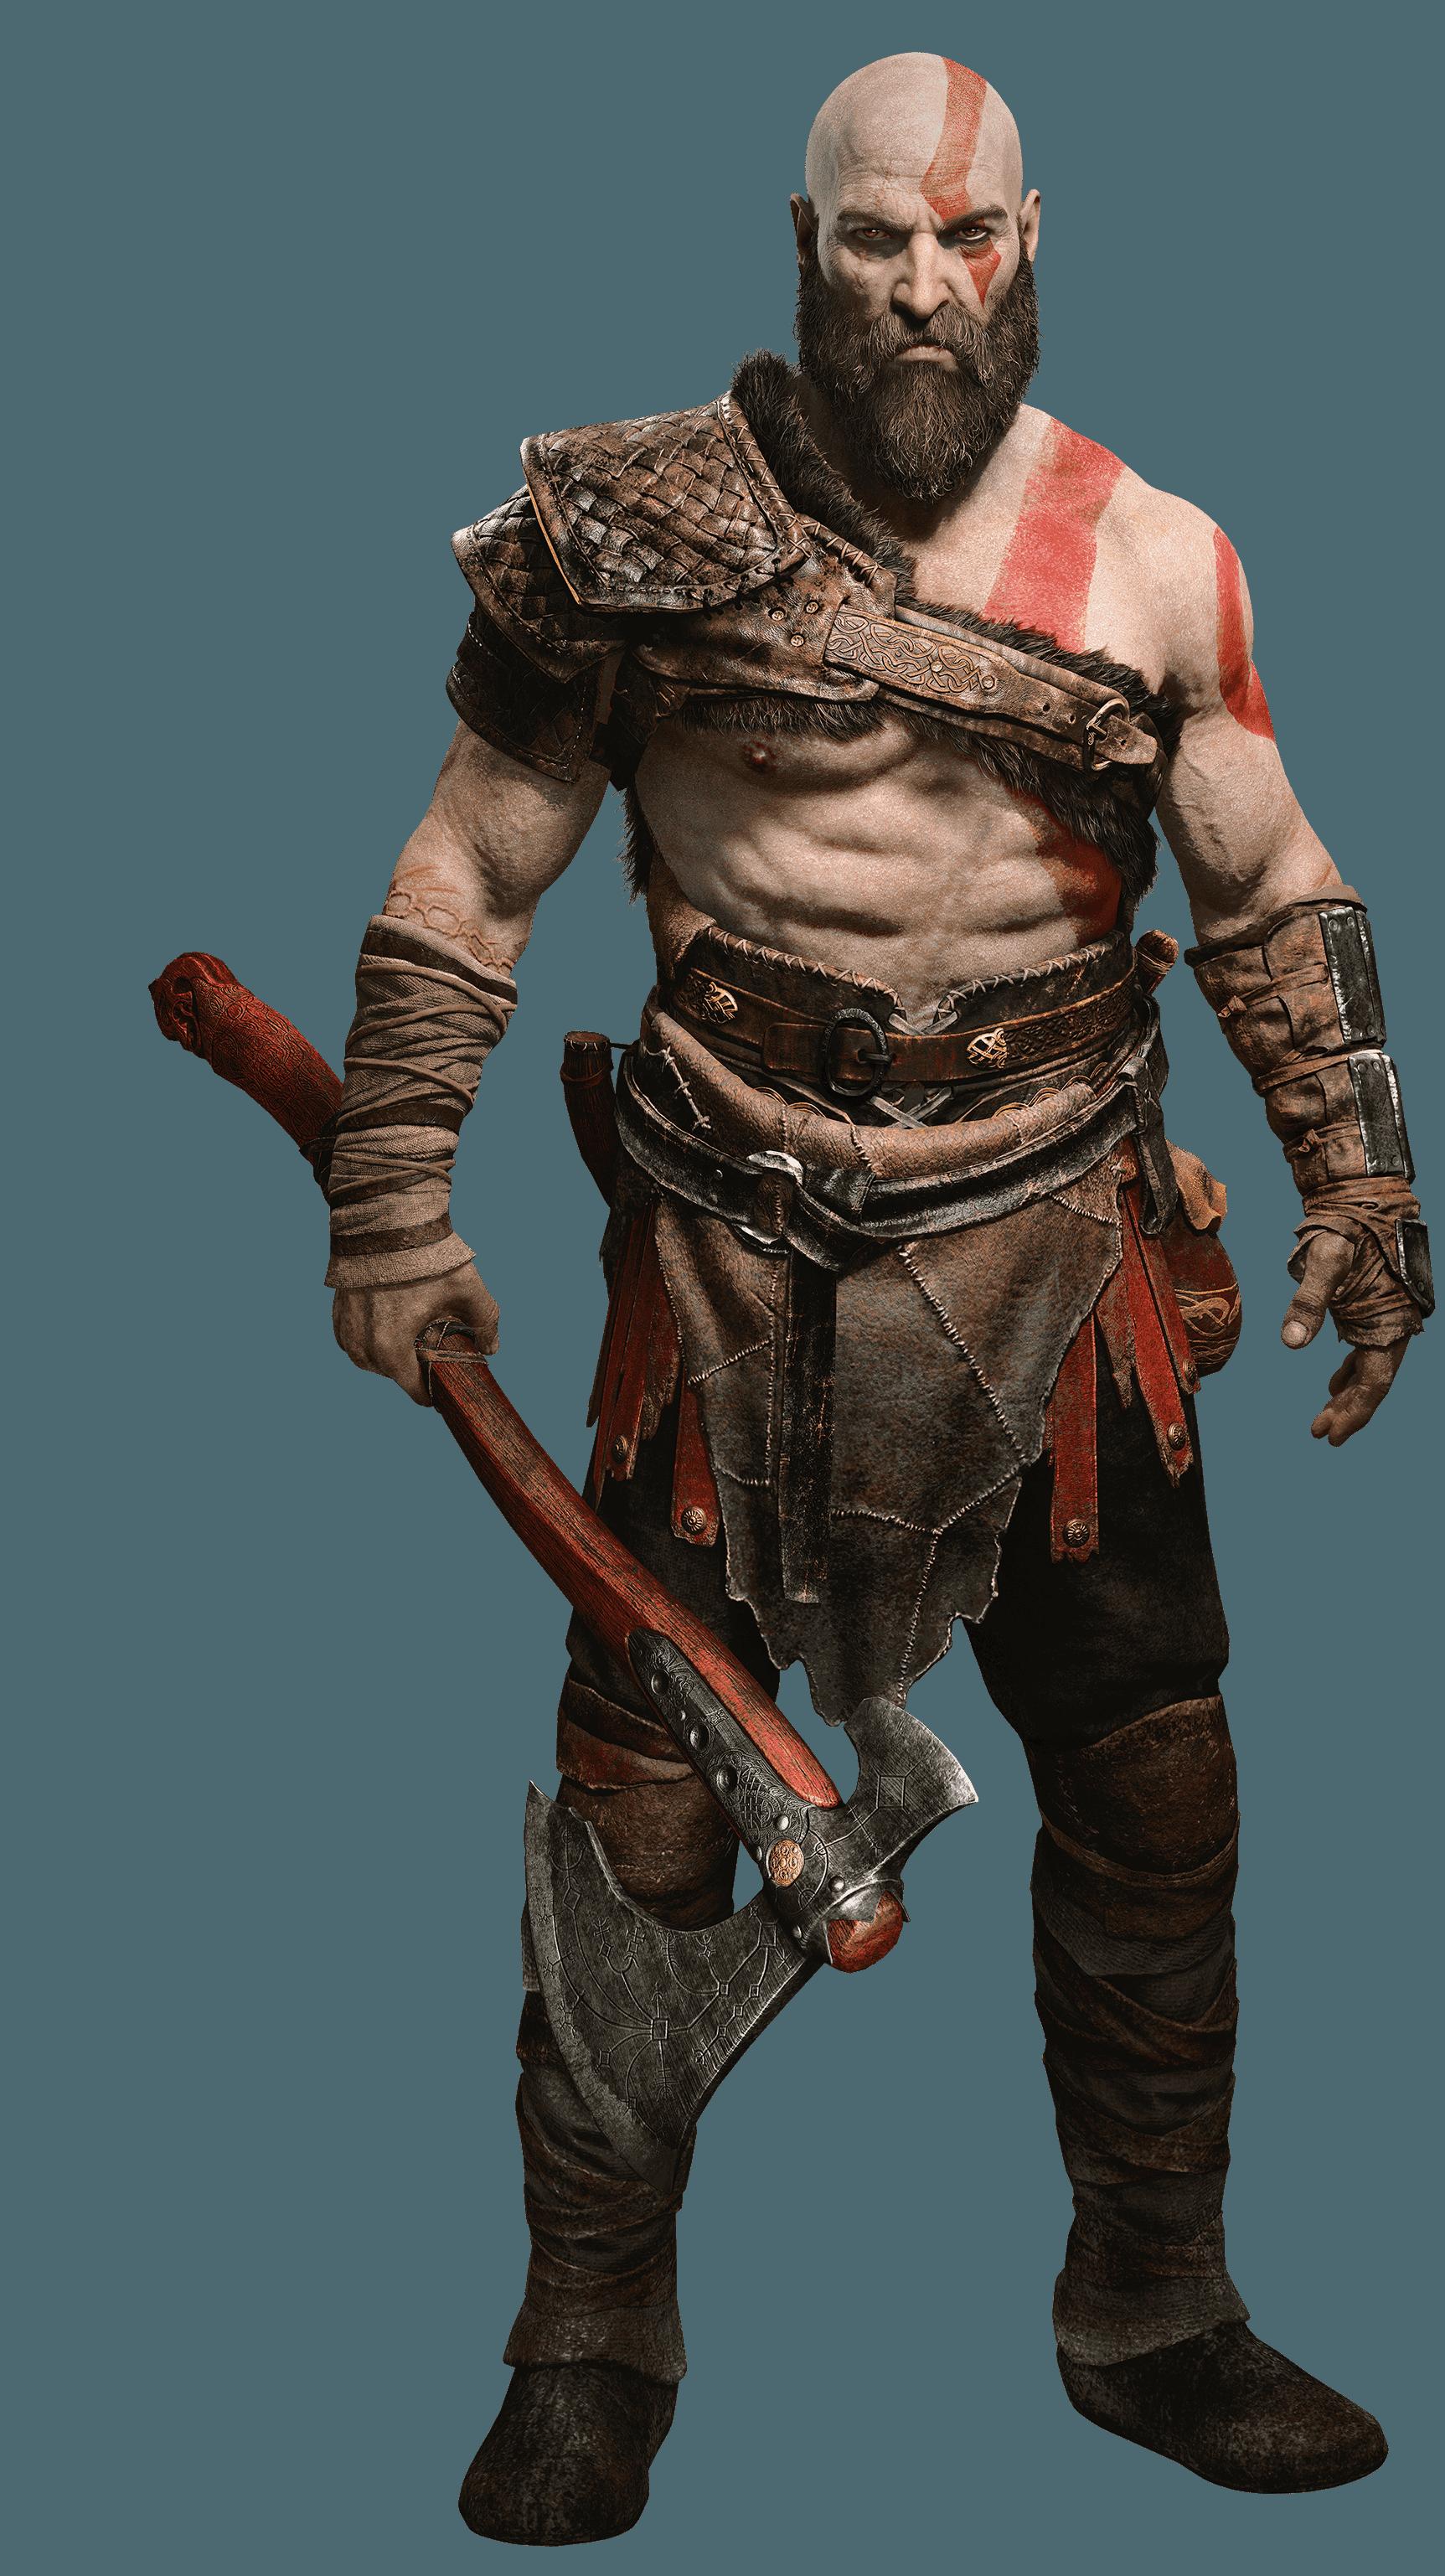 kratos_new_god_of_war_by_sonimbleinim_db